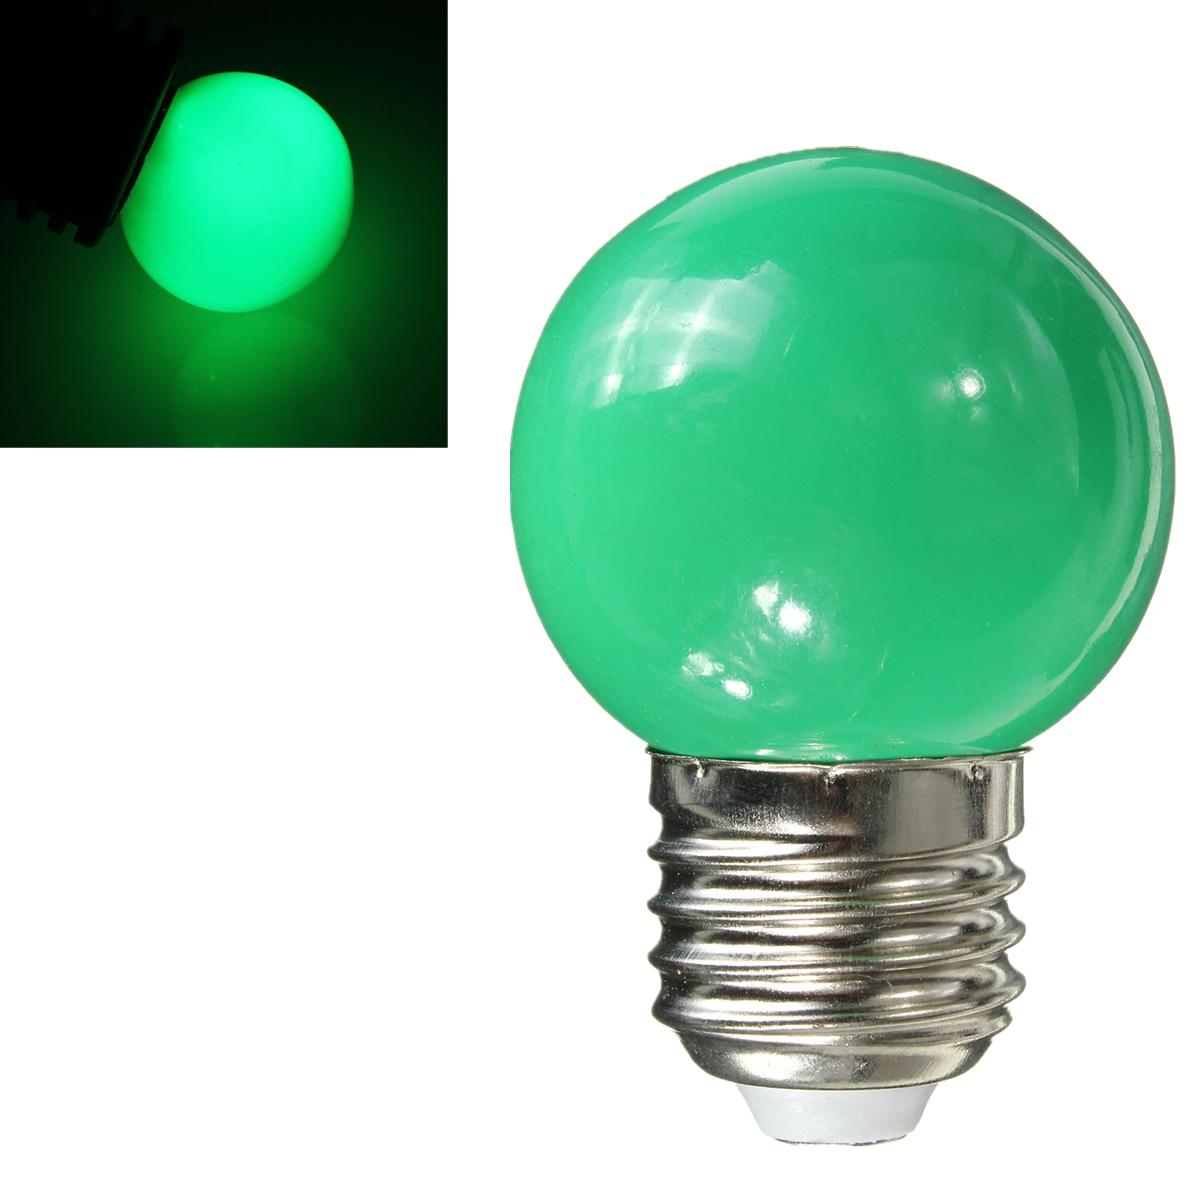 E27 High Power Smd Spot Light Energy Saving Lamps Multi Colour Led Bulb 220v